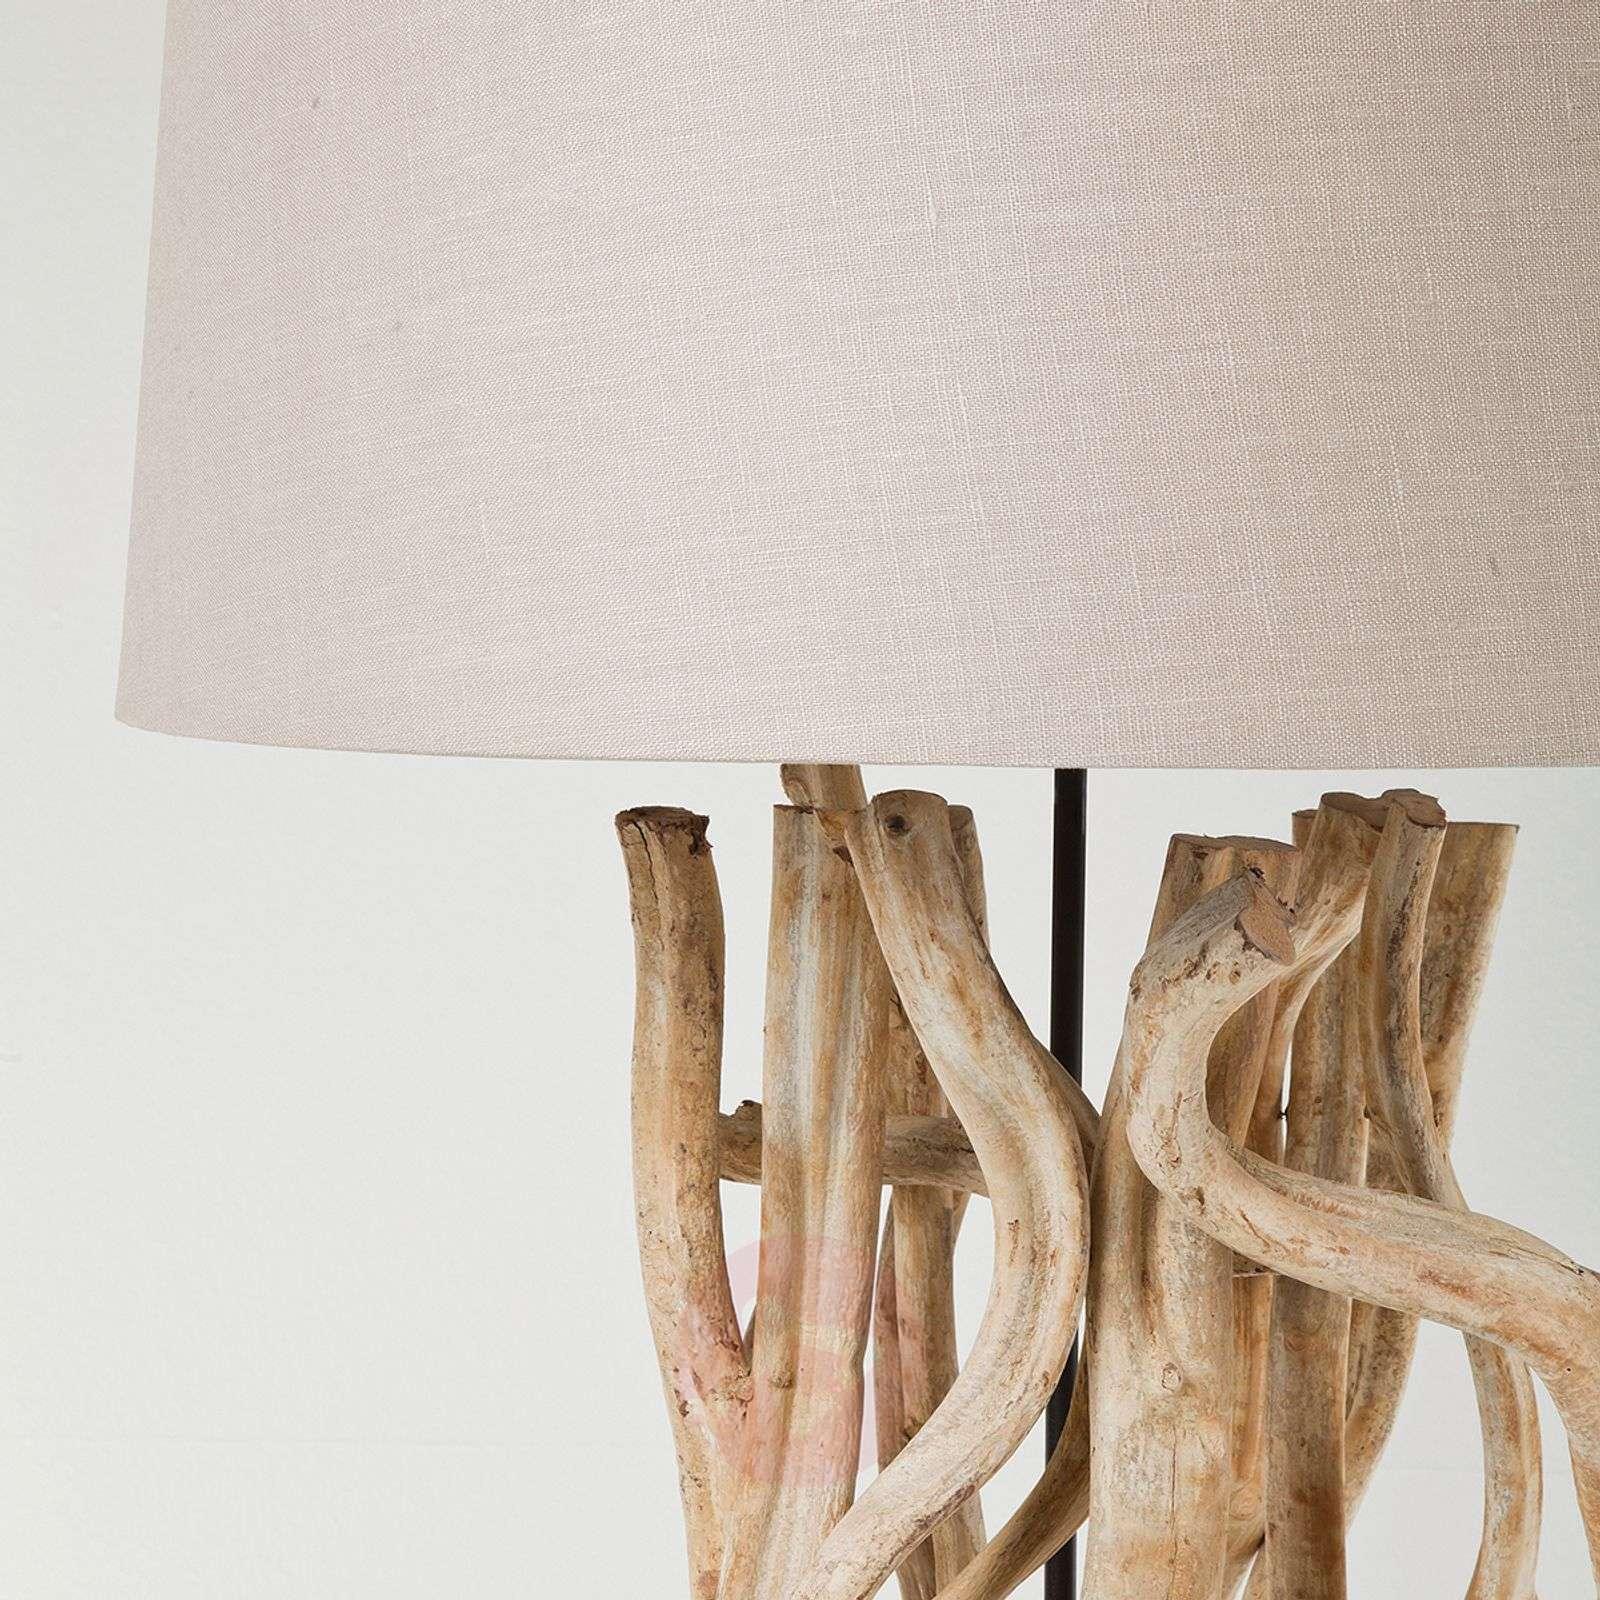 KARE Scultra natural-looking floor lamp-5517463-01